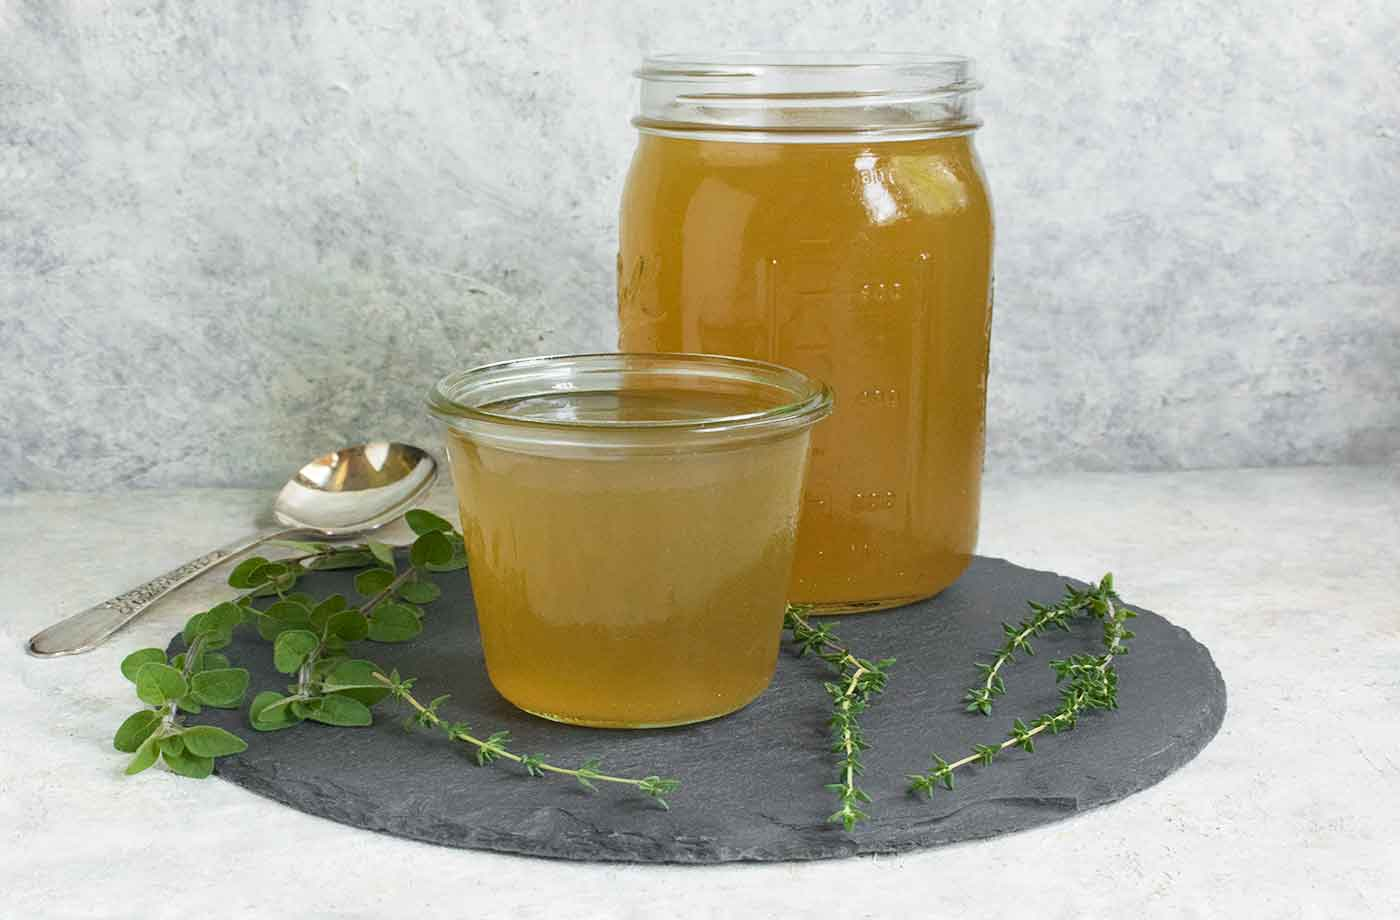 Instant Pot Smoked Corn Stock in jars